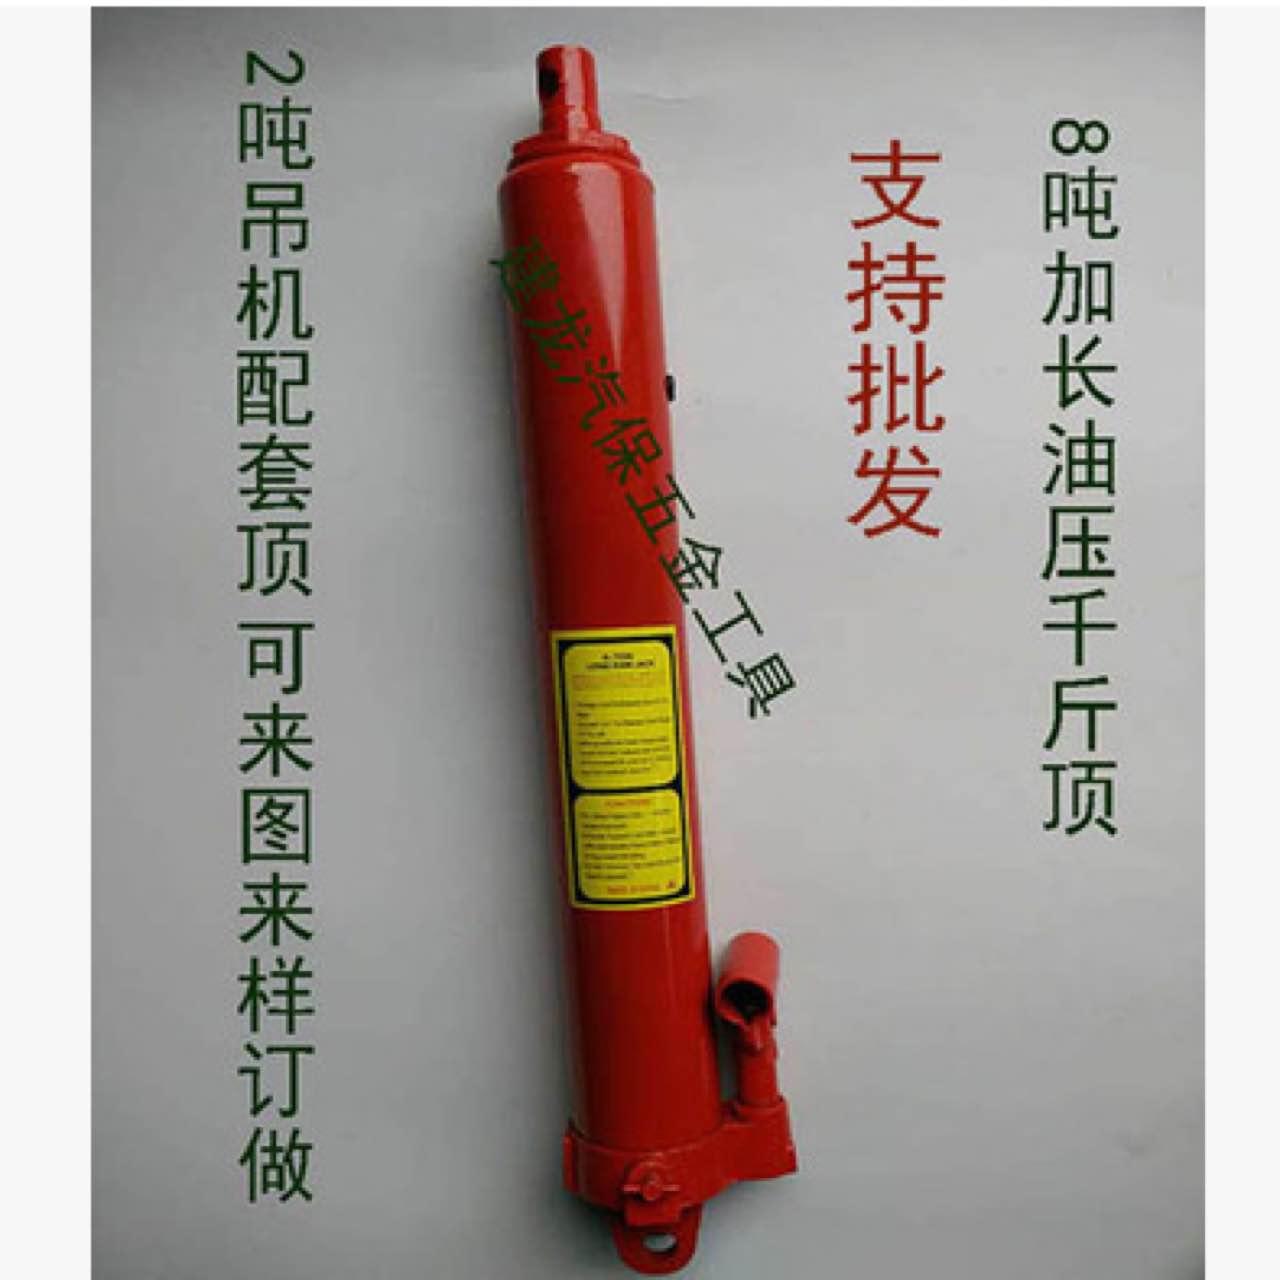 12c20c17正锐220V电动扳手电动风炮电动套筒扳手电动冲击扳手套装